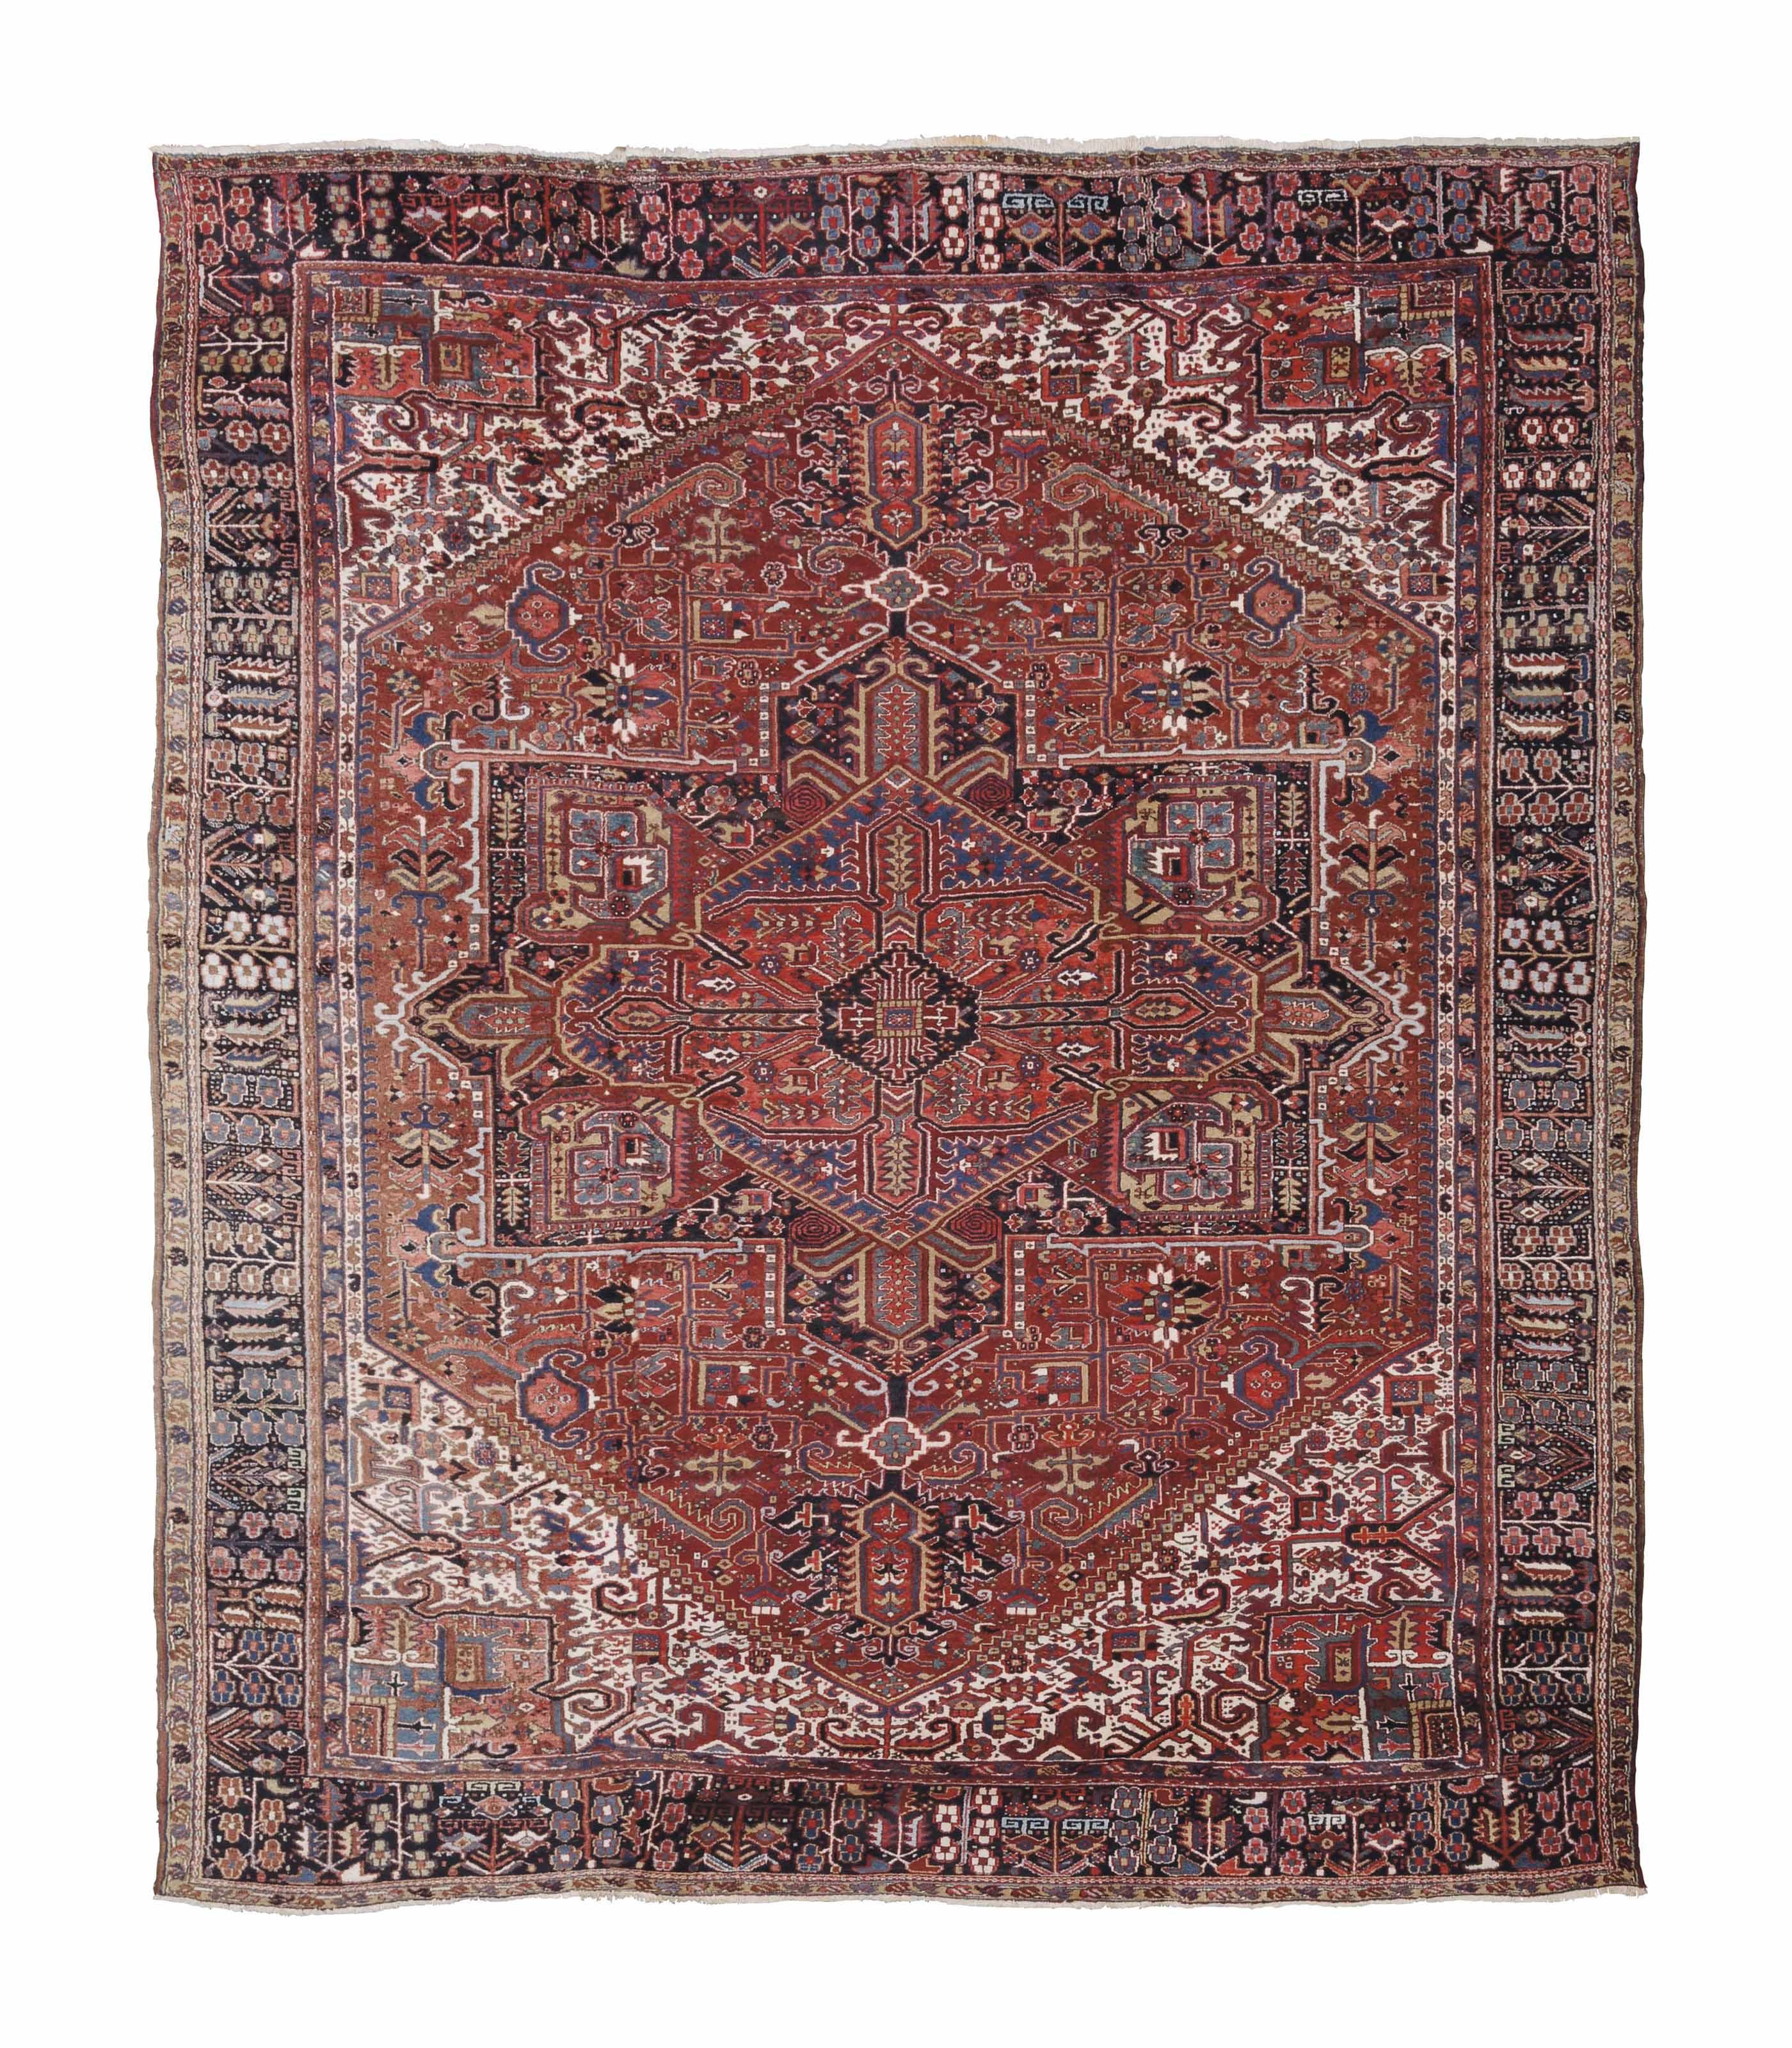 A large Heriz carpet